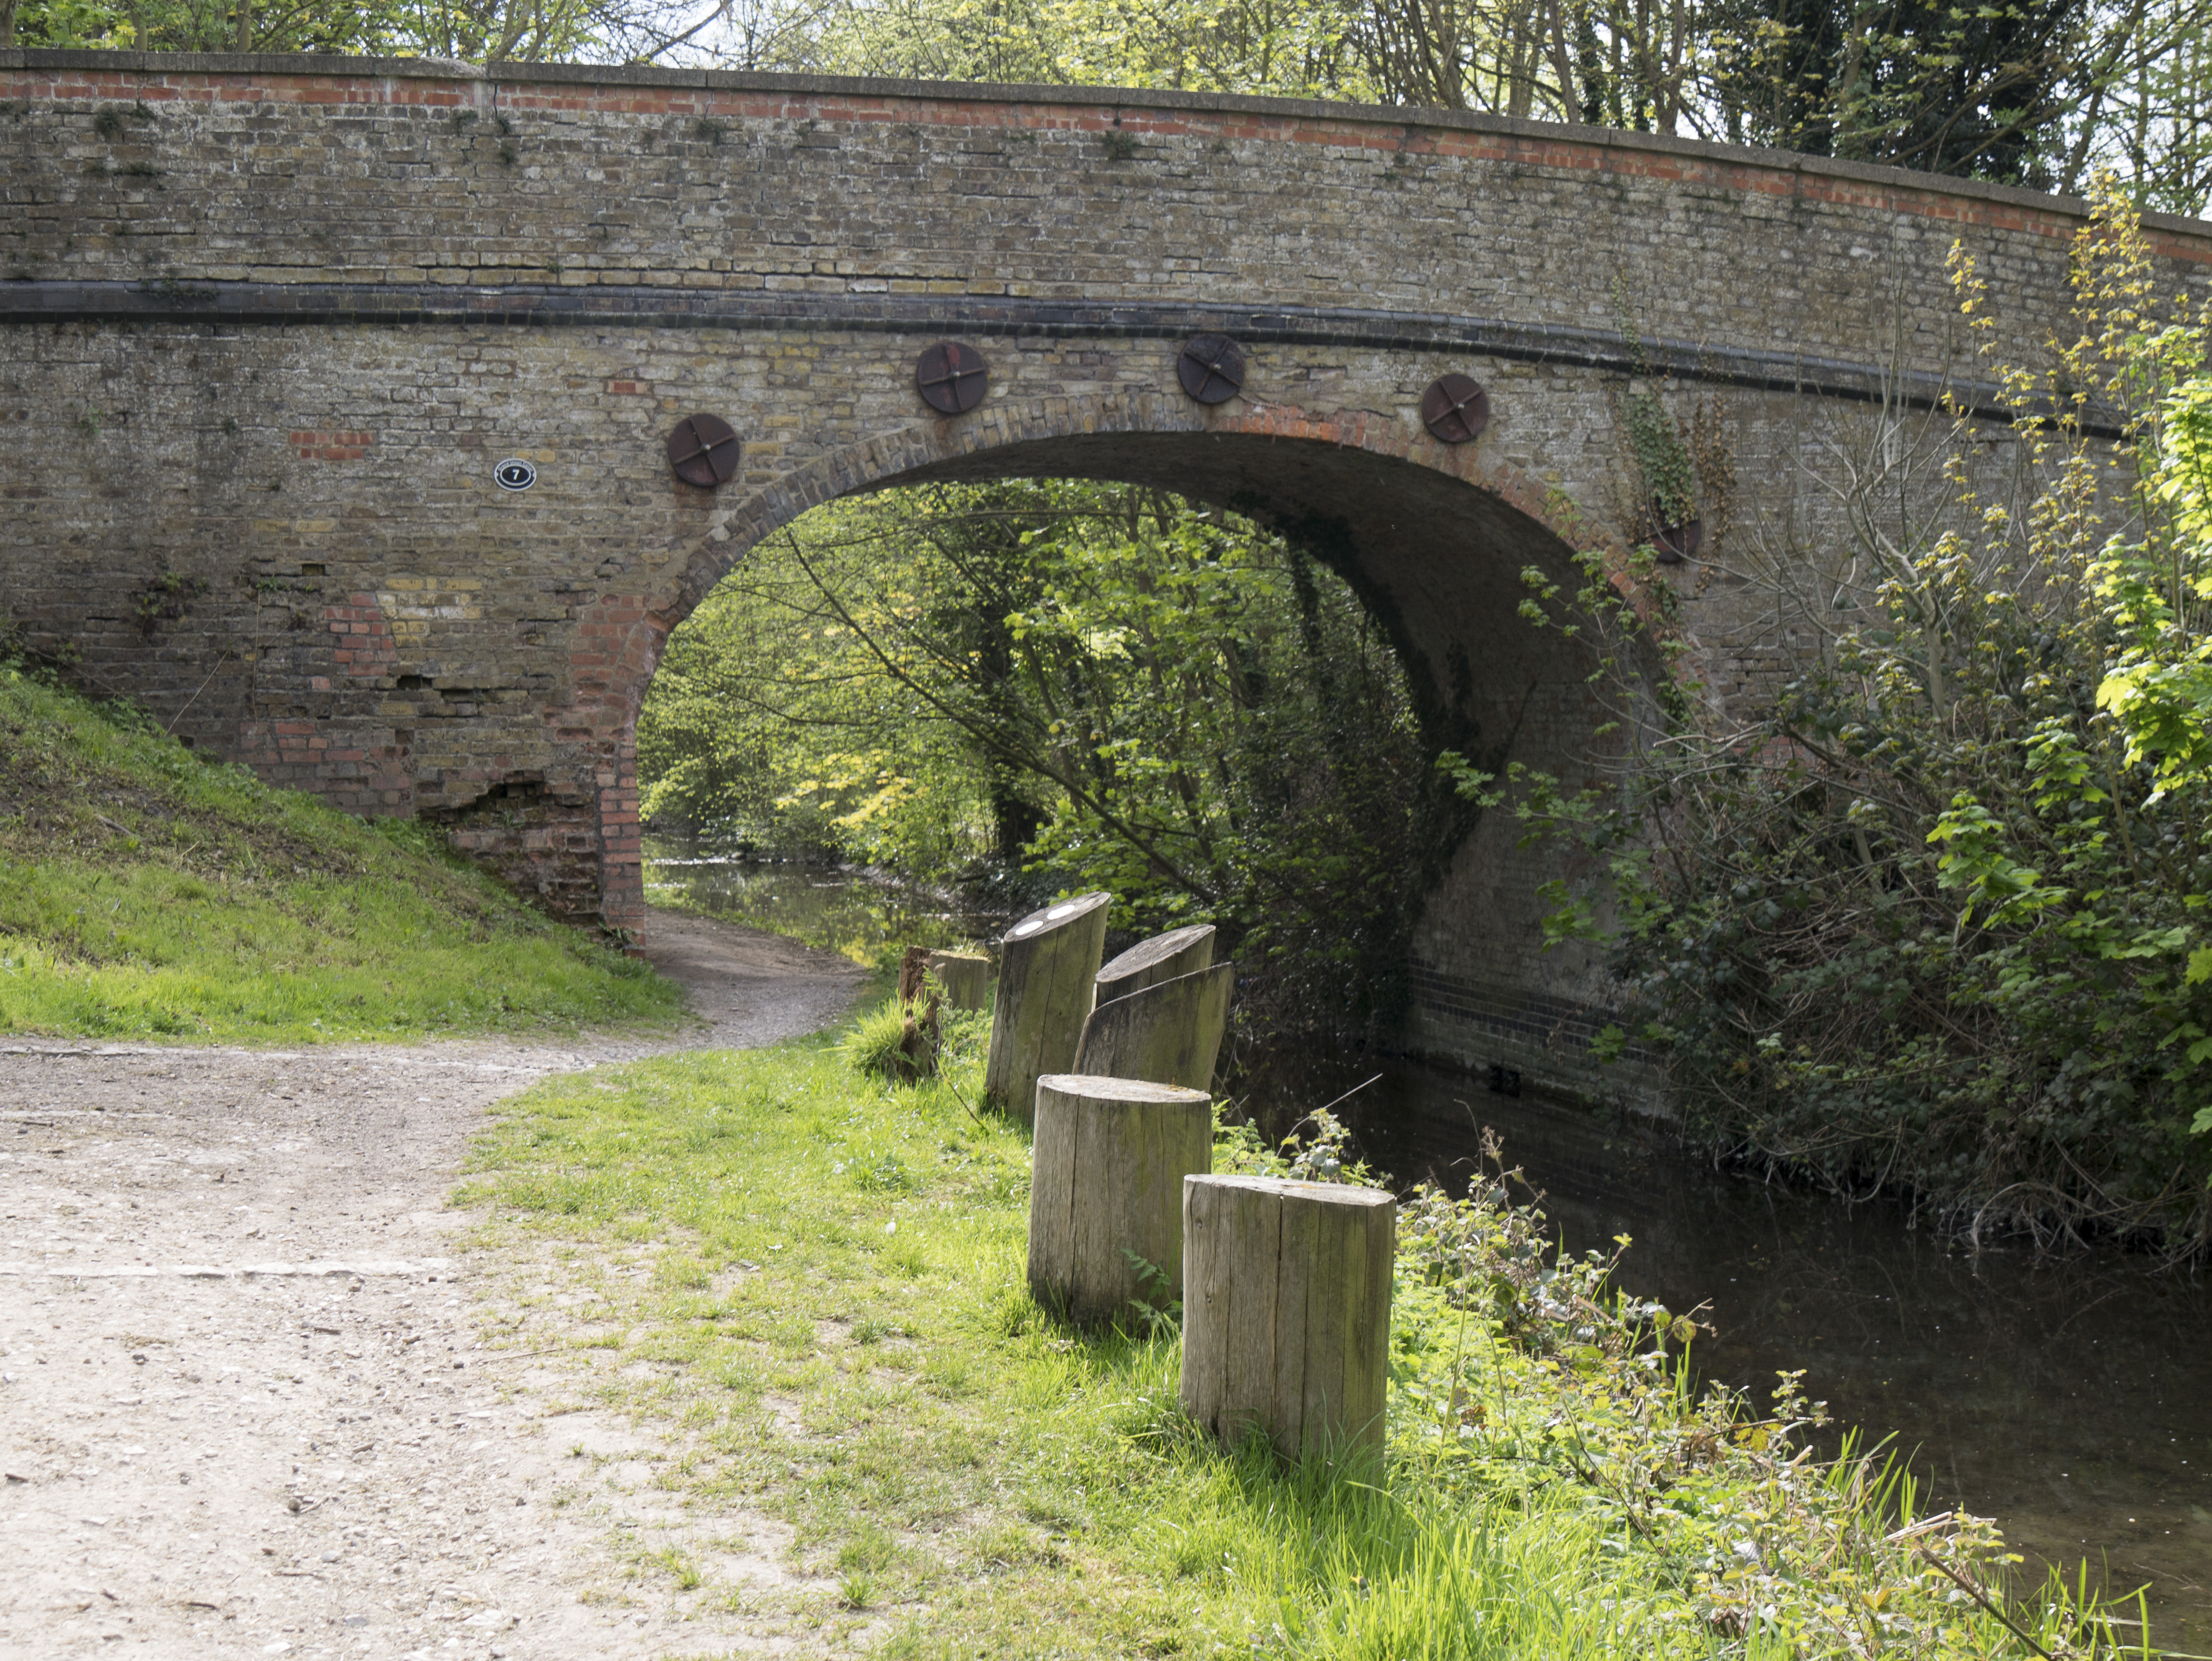 Wellonhead bridge